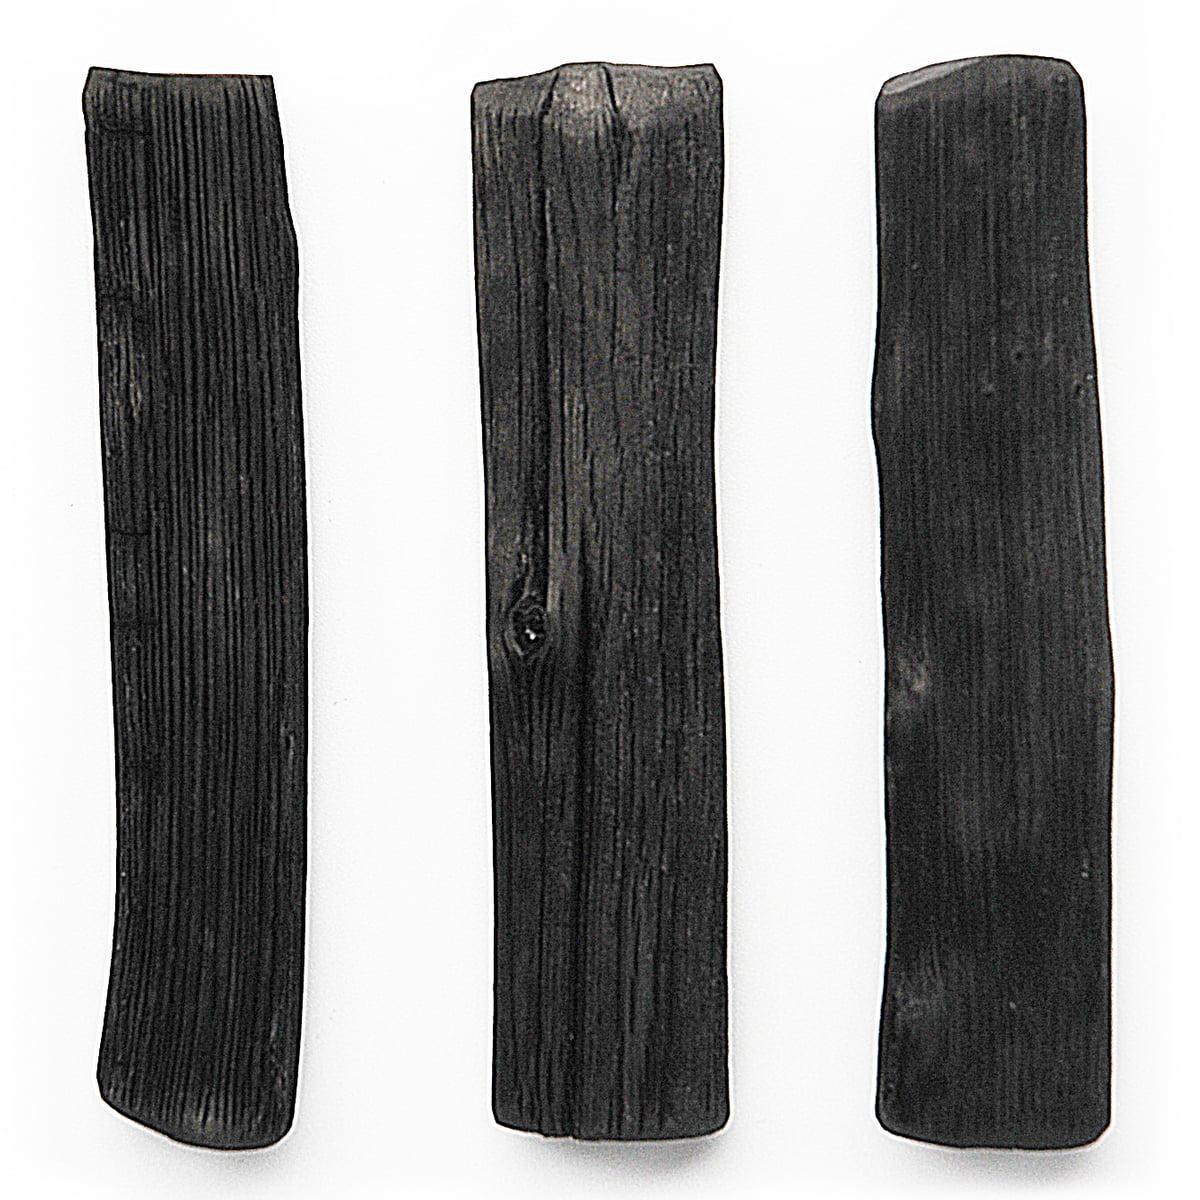 binchotan active charcoal black blum shop. Black Bedroom Furniture Sets. Home Design Ideas